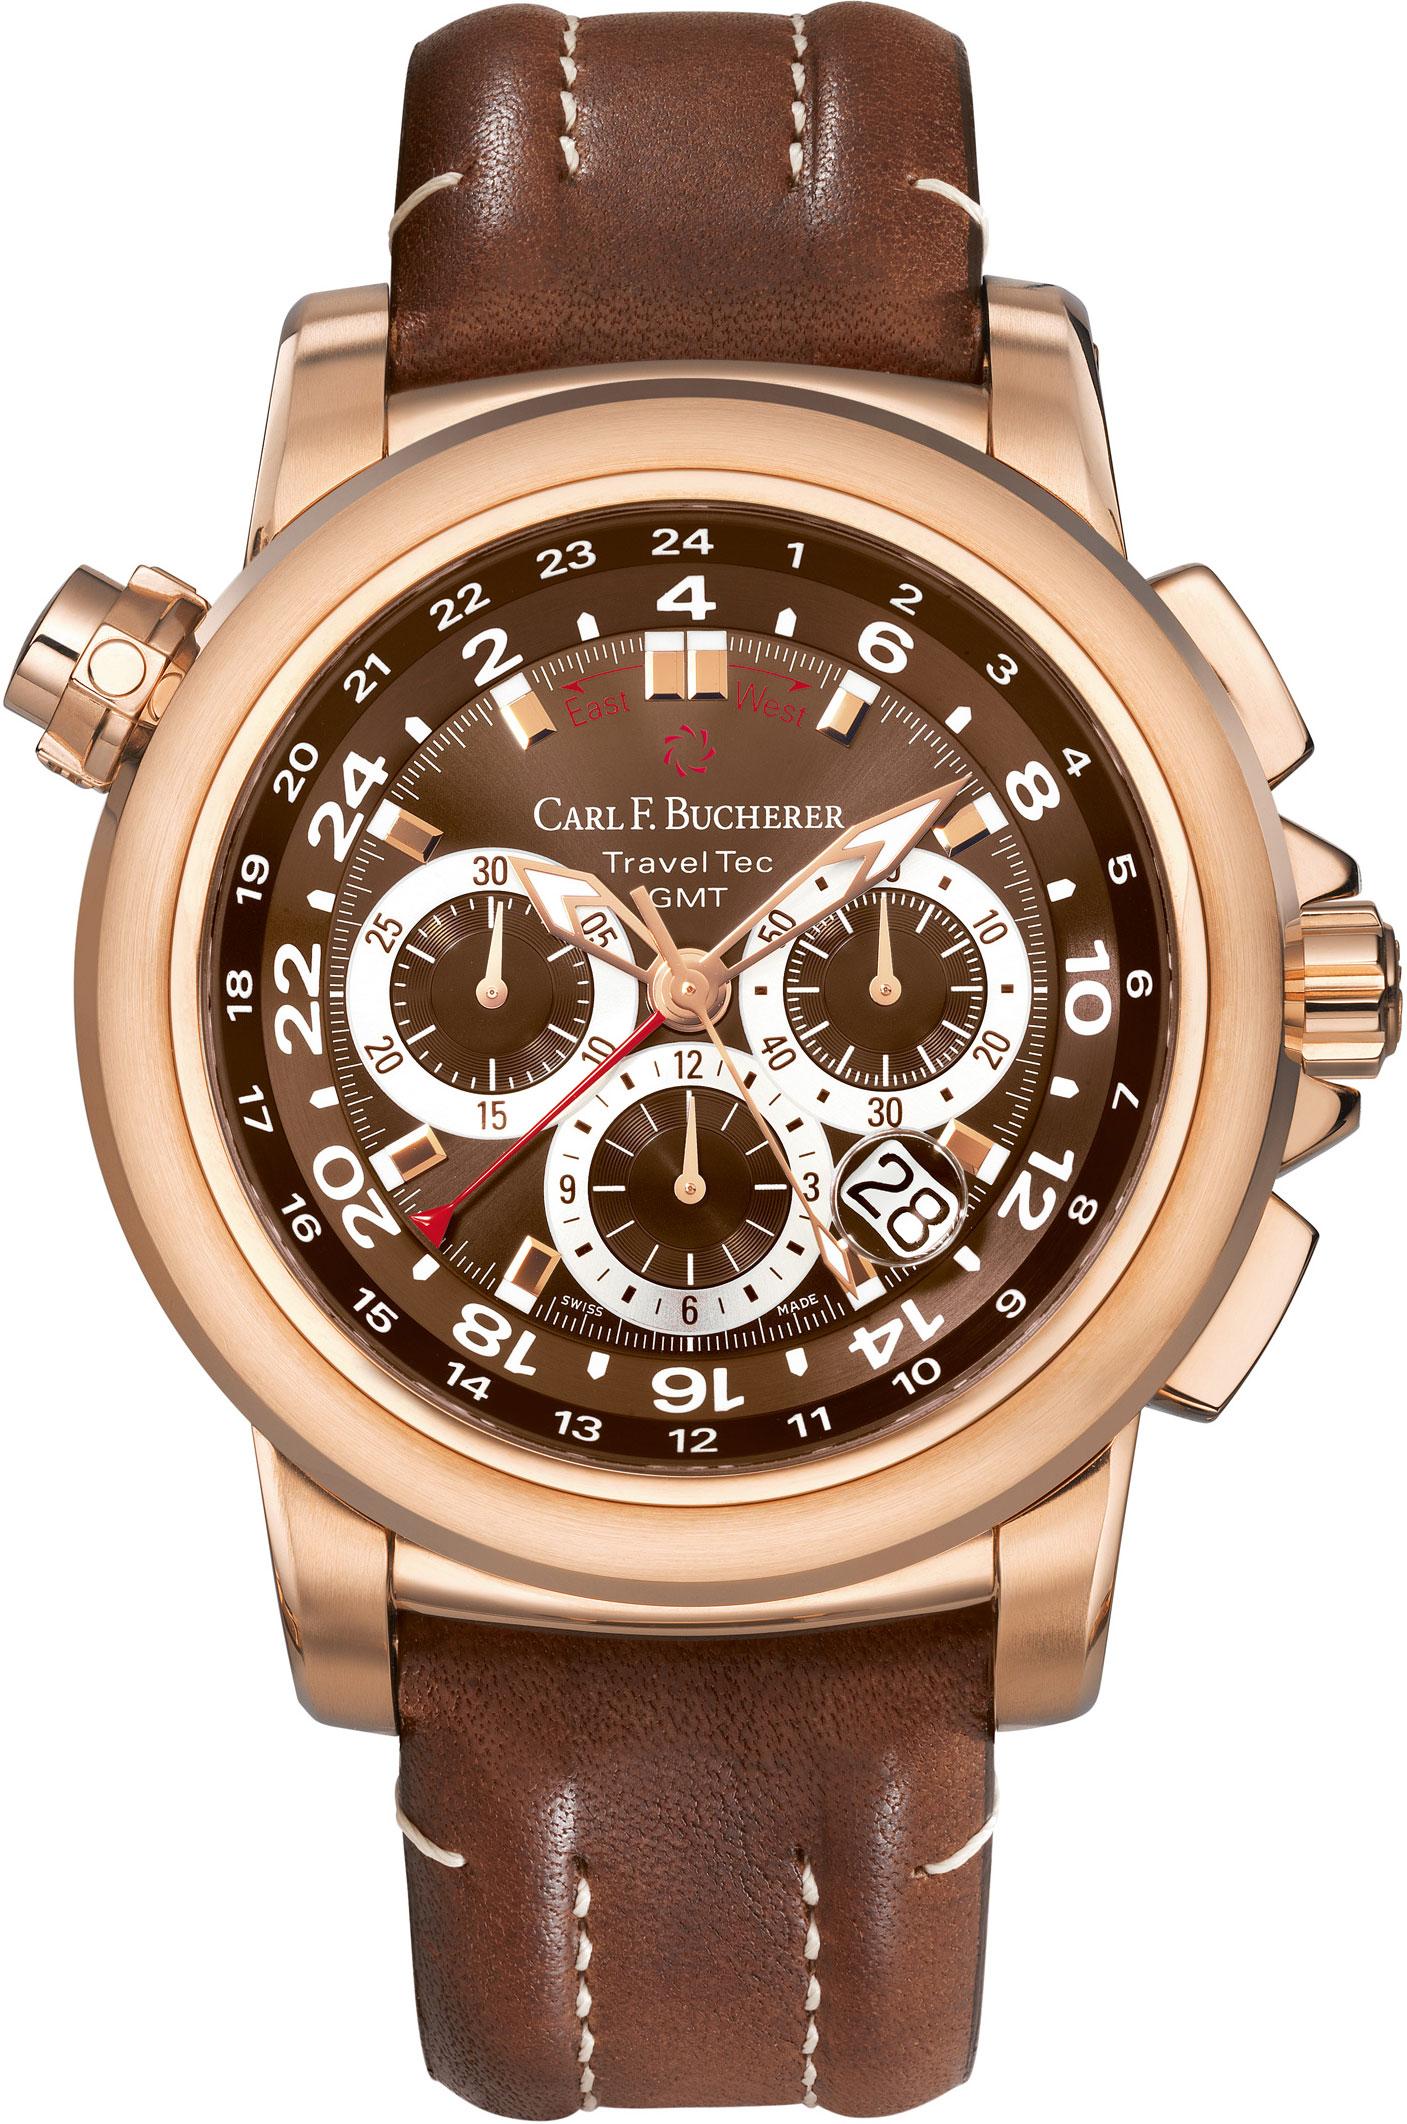 Image of Carl F. Bucherer Patravi Traveltec GMT Mens Watch Model 00.10620.03.93.01